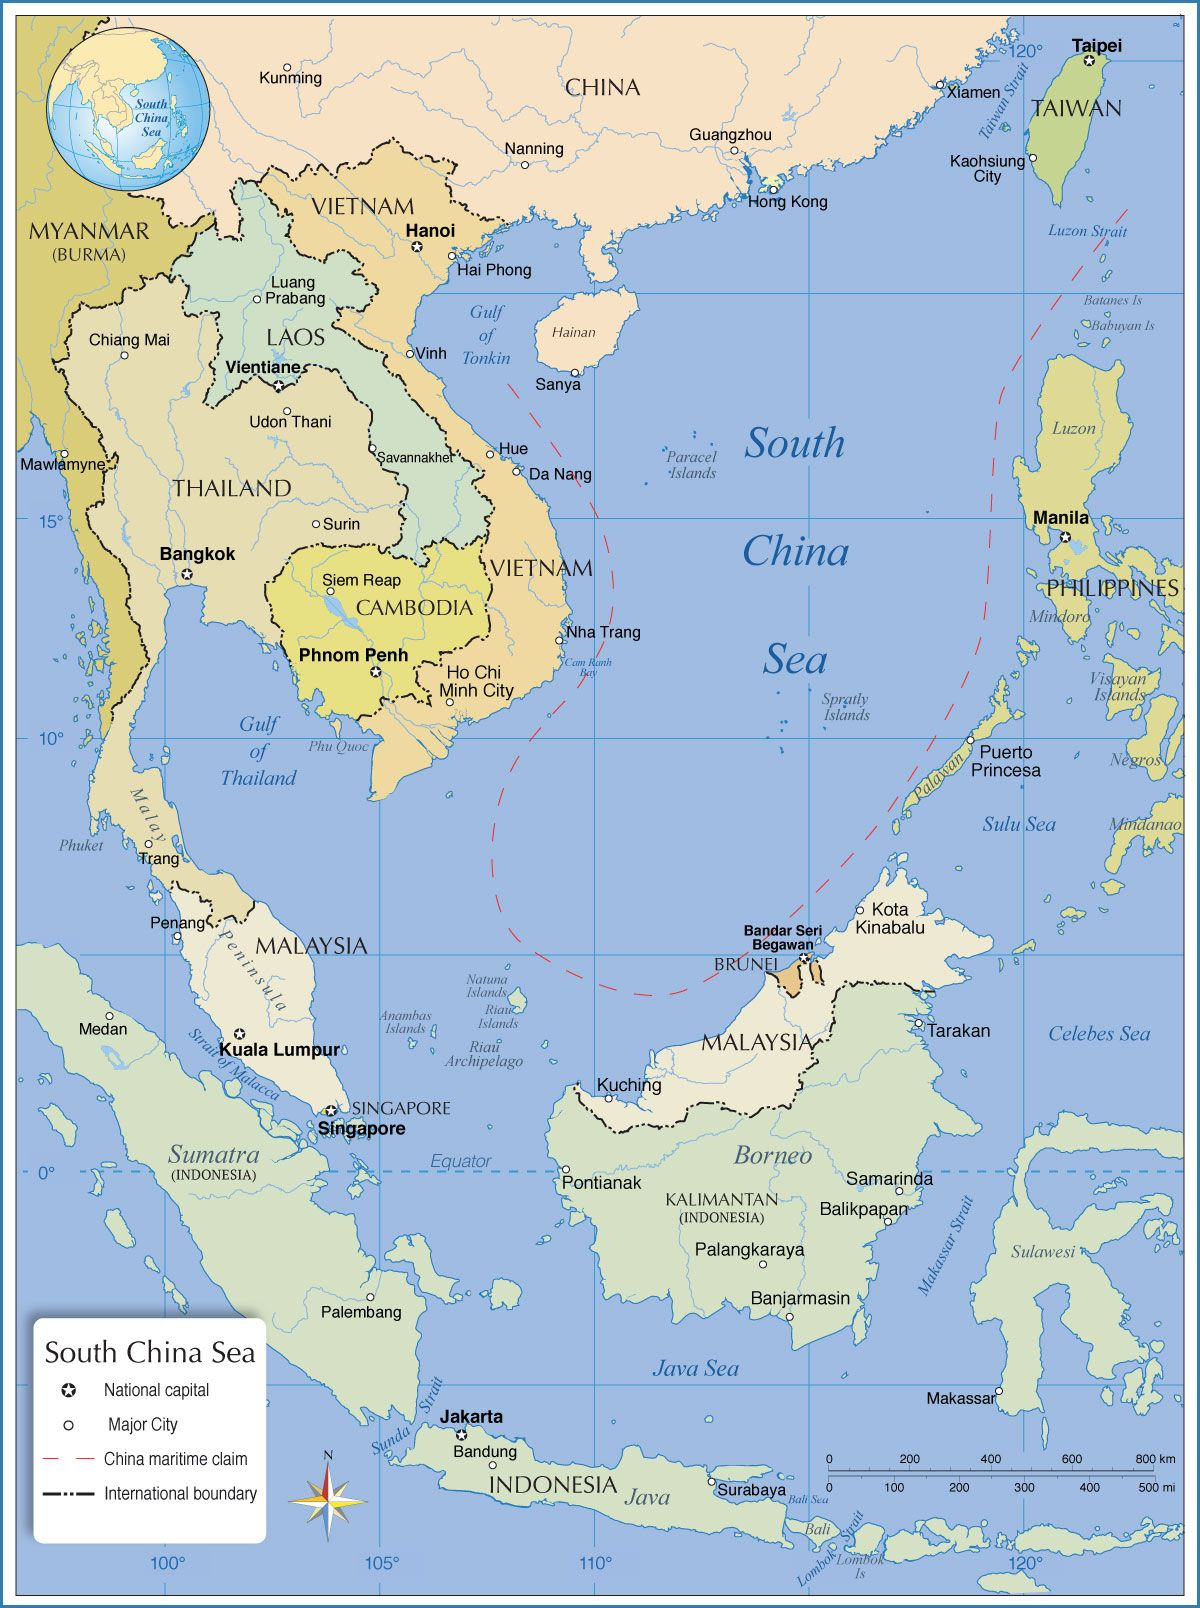 Asian region map